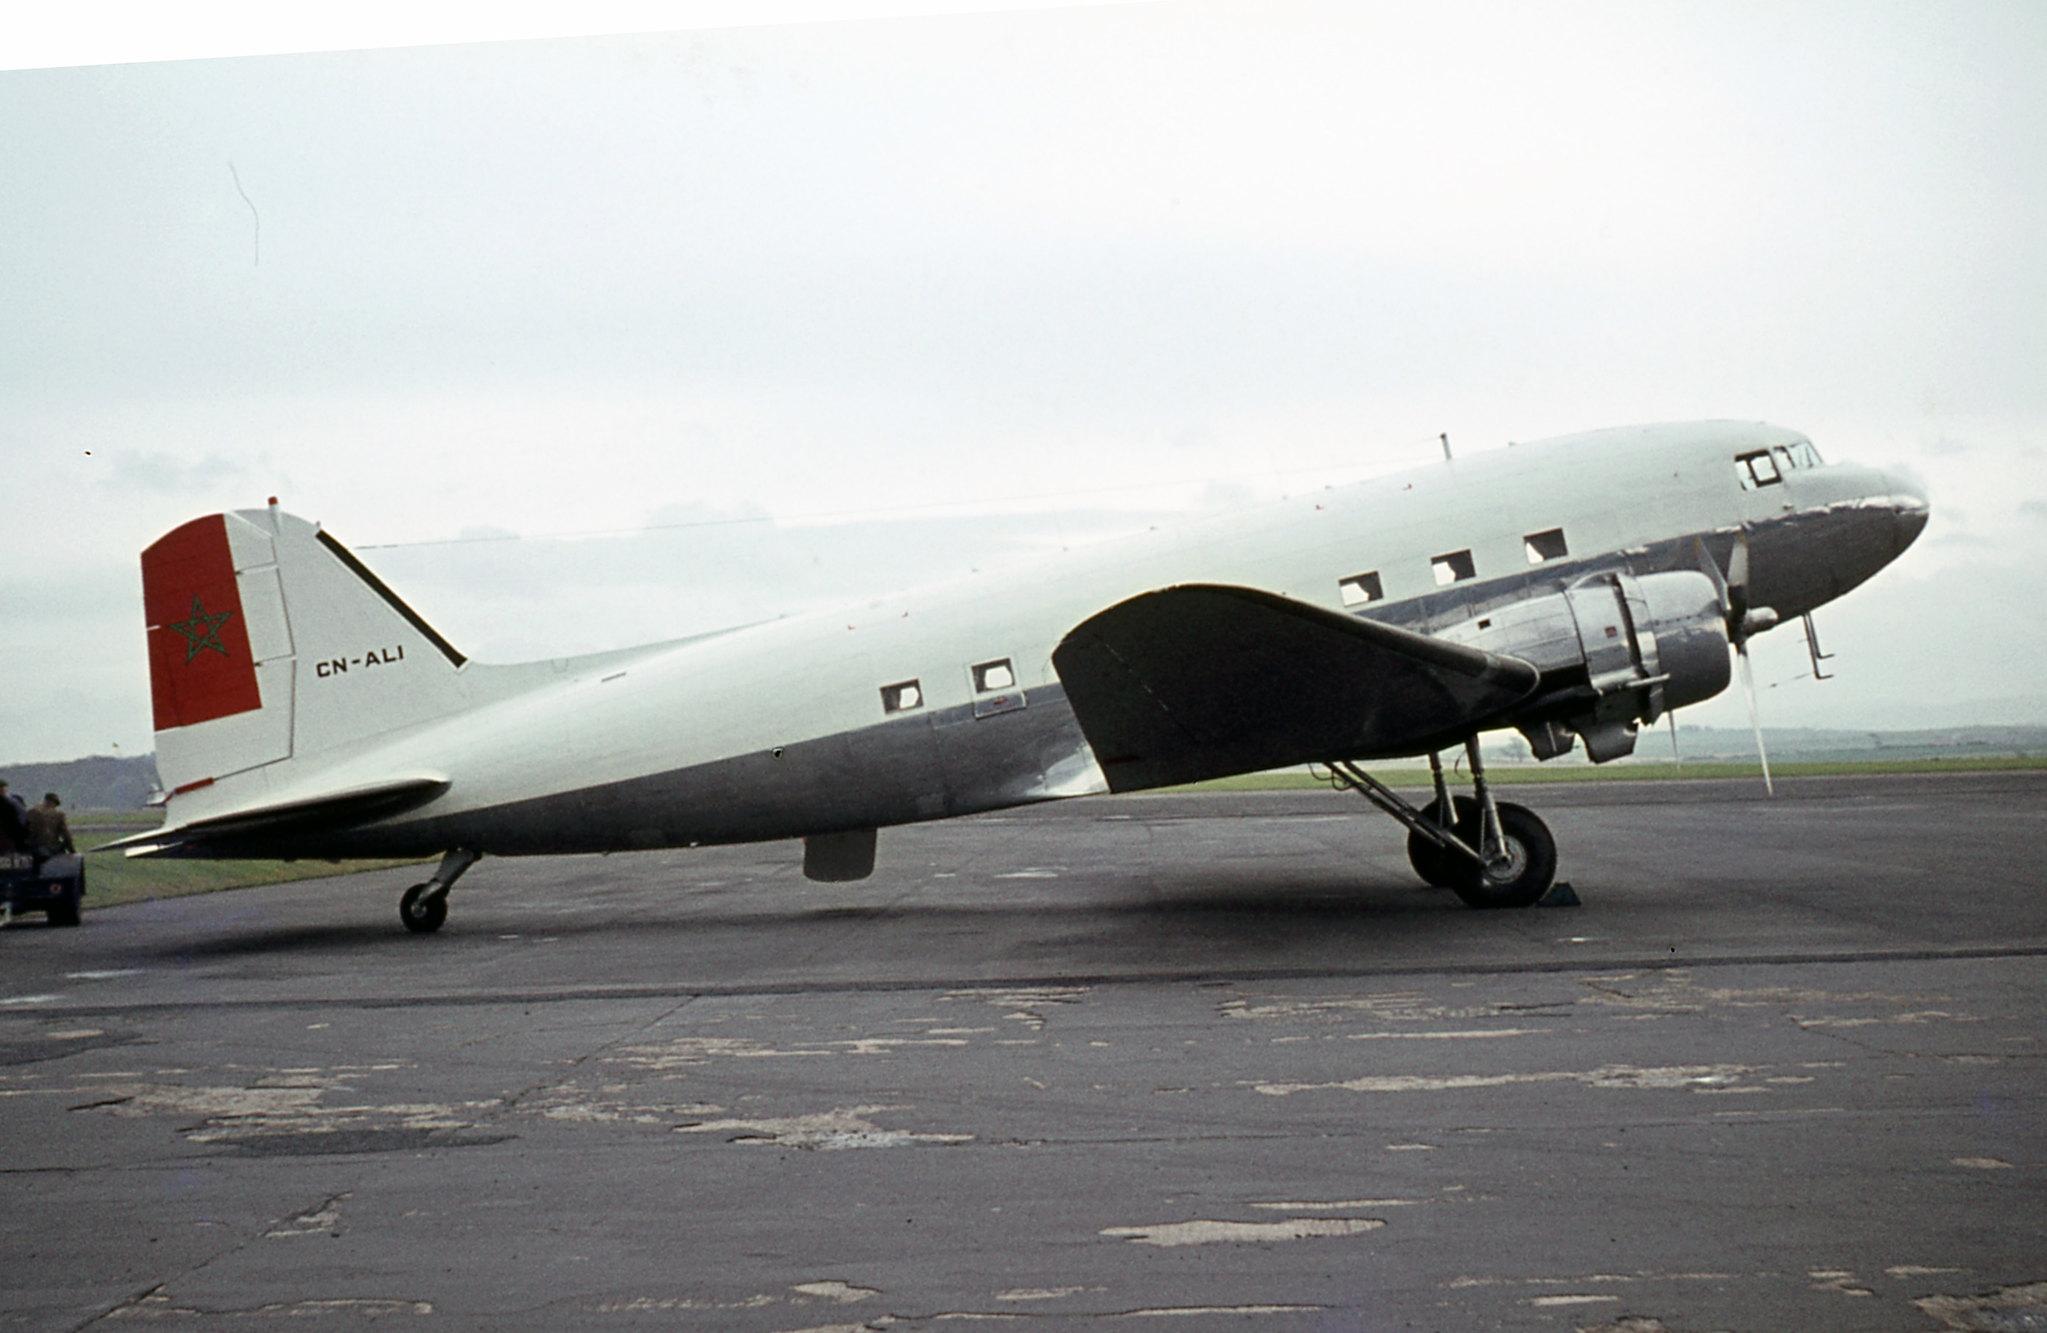 FRA: Photos anciens avions des FRA - Page 10 44591913484_3c76fbf11e_k